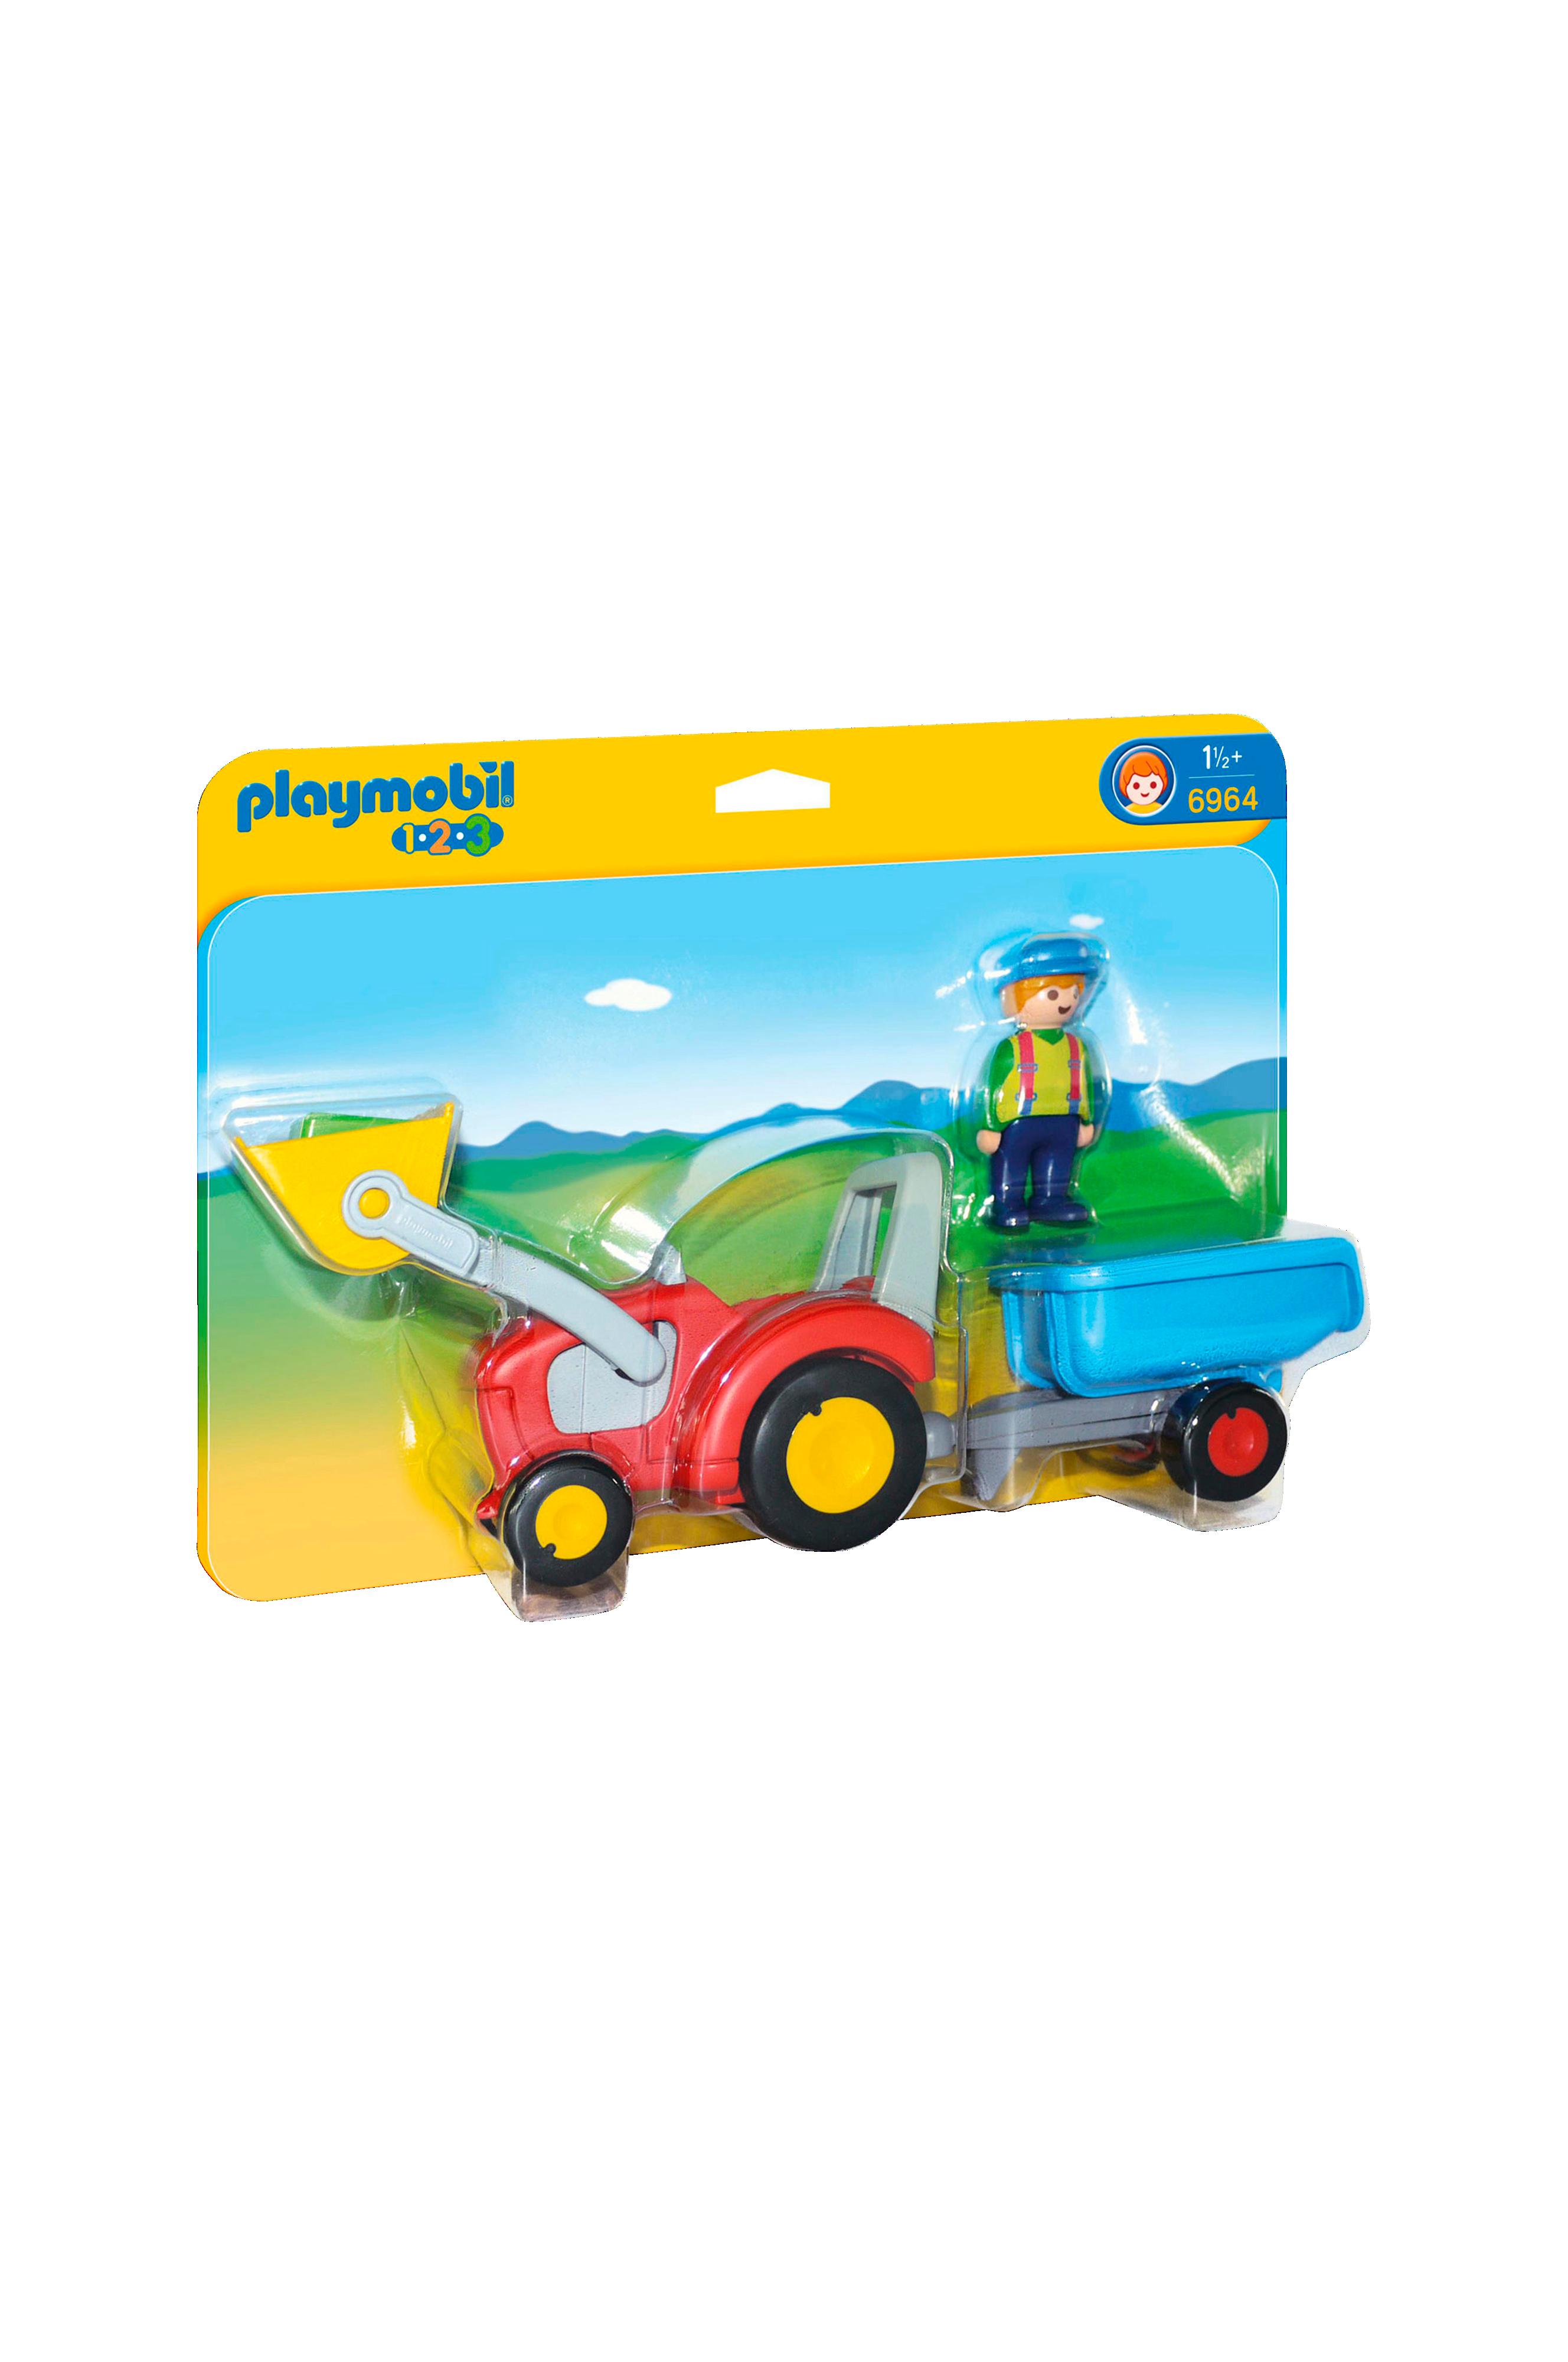 playmobil 1 2 3 1 2 3 traktor med sl p barn. Black Bedroom Furniture Sets. Home Design Ideas